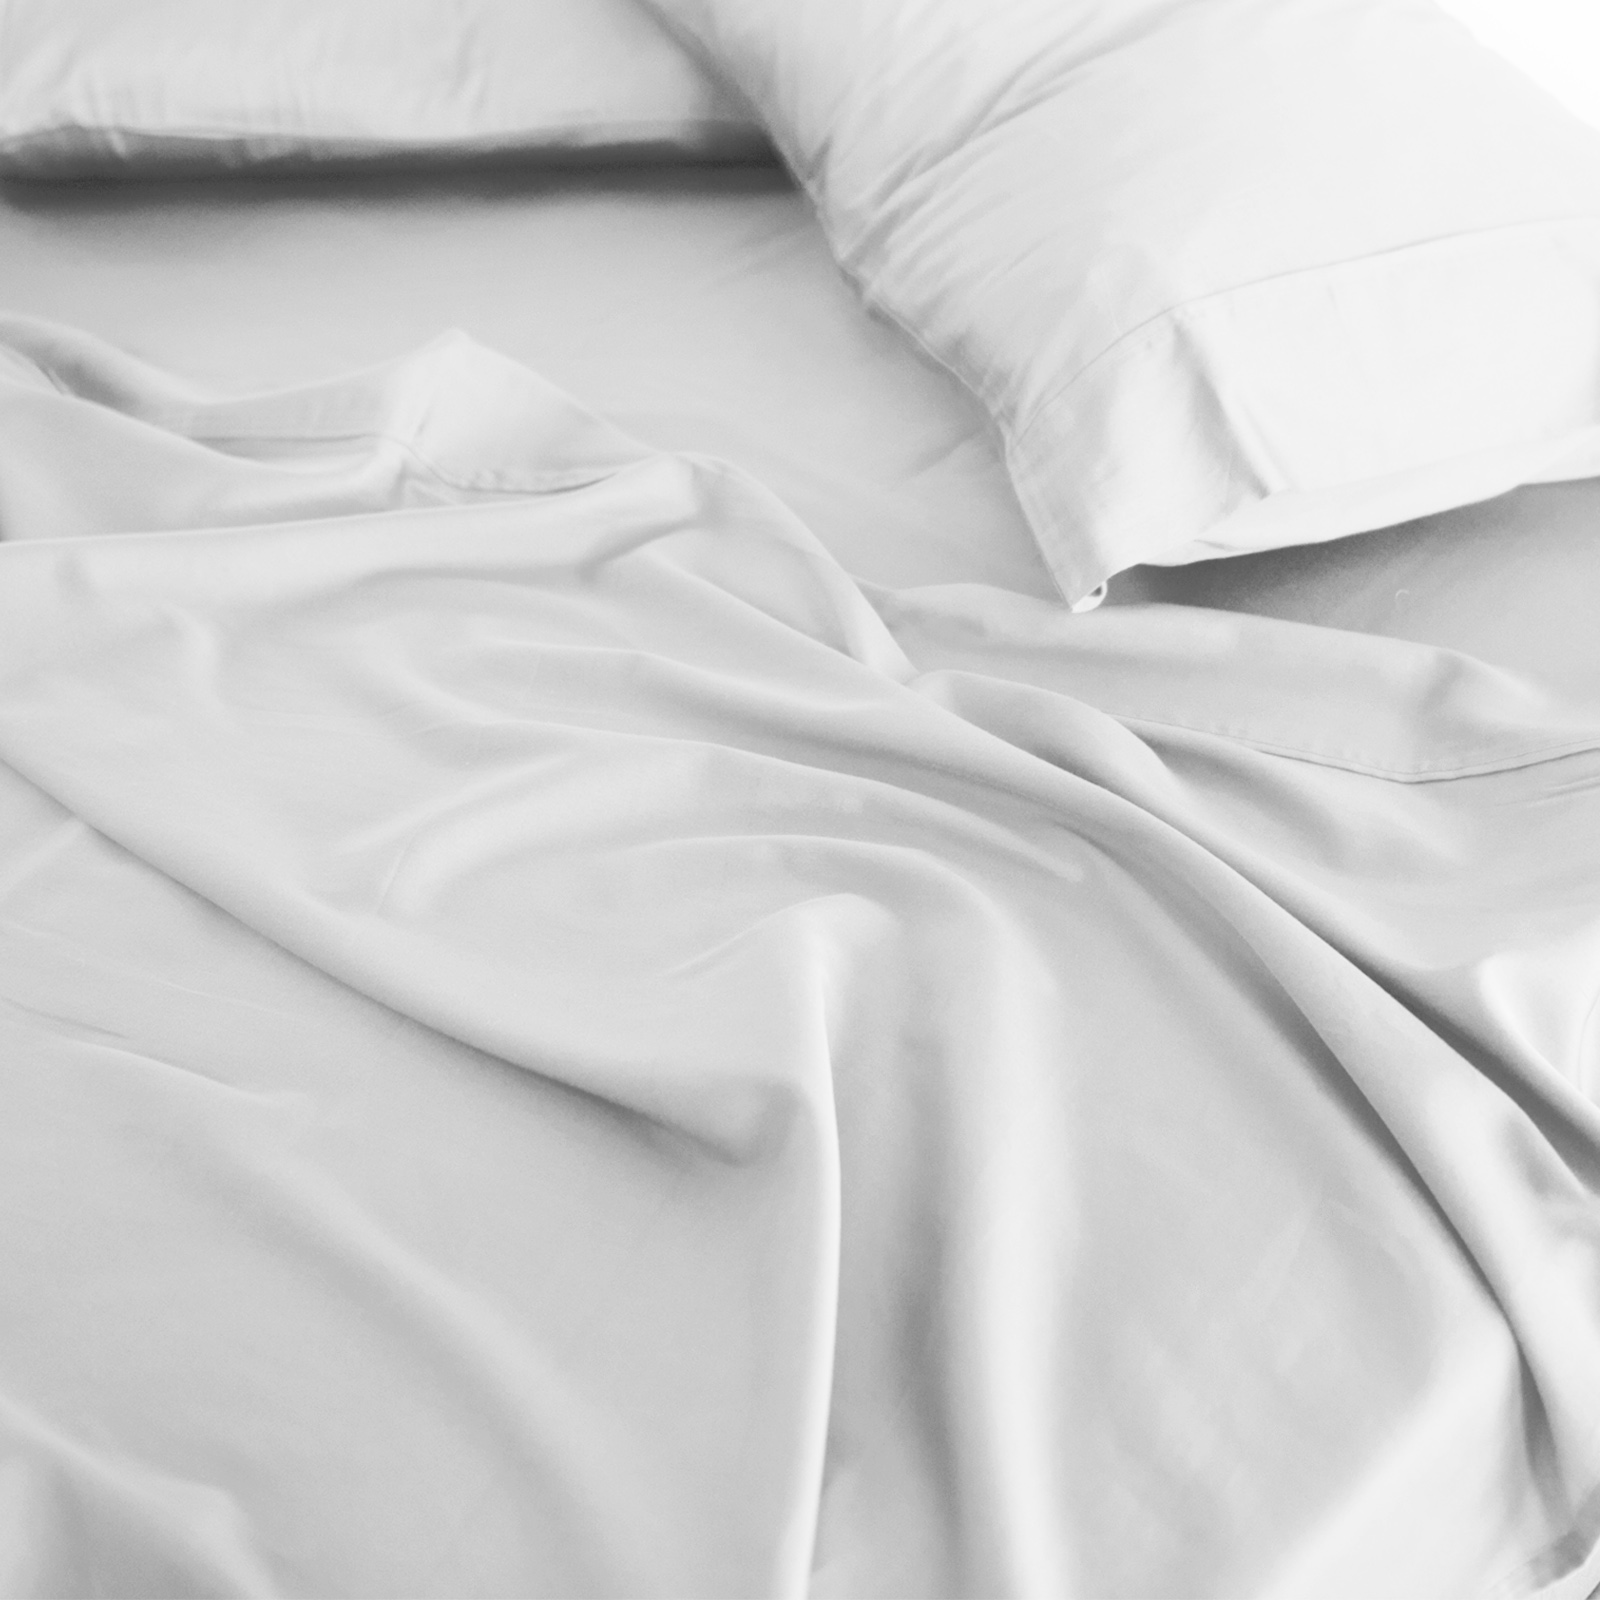 thumbnail 77 - Royal Comfort 1000TC Hotel Grade Bamboo Cotton Sheets Pillowcases Set Ultrasoft